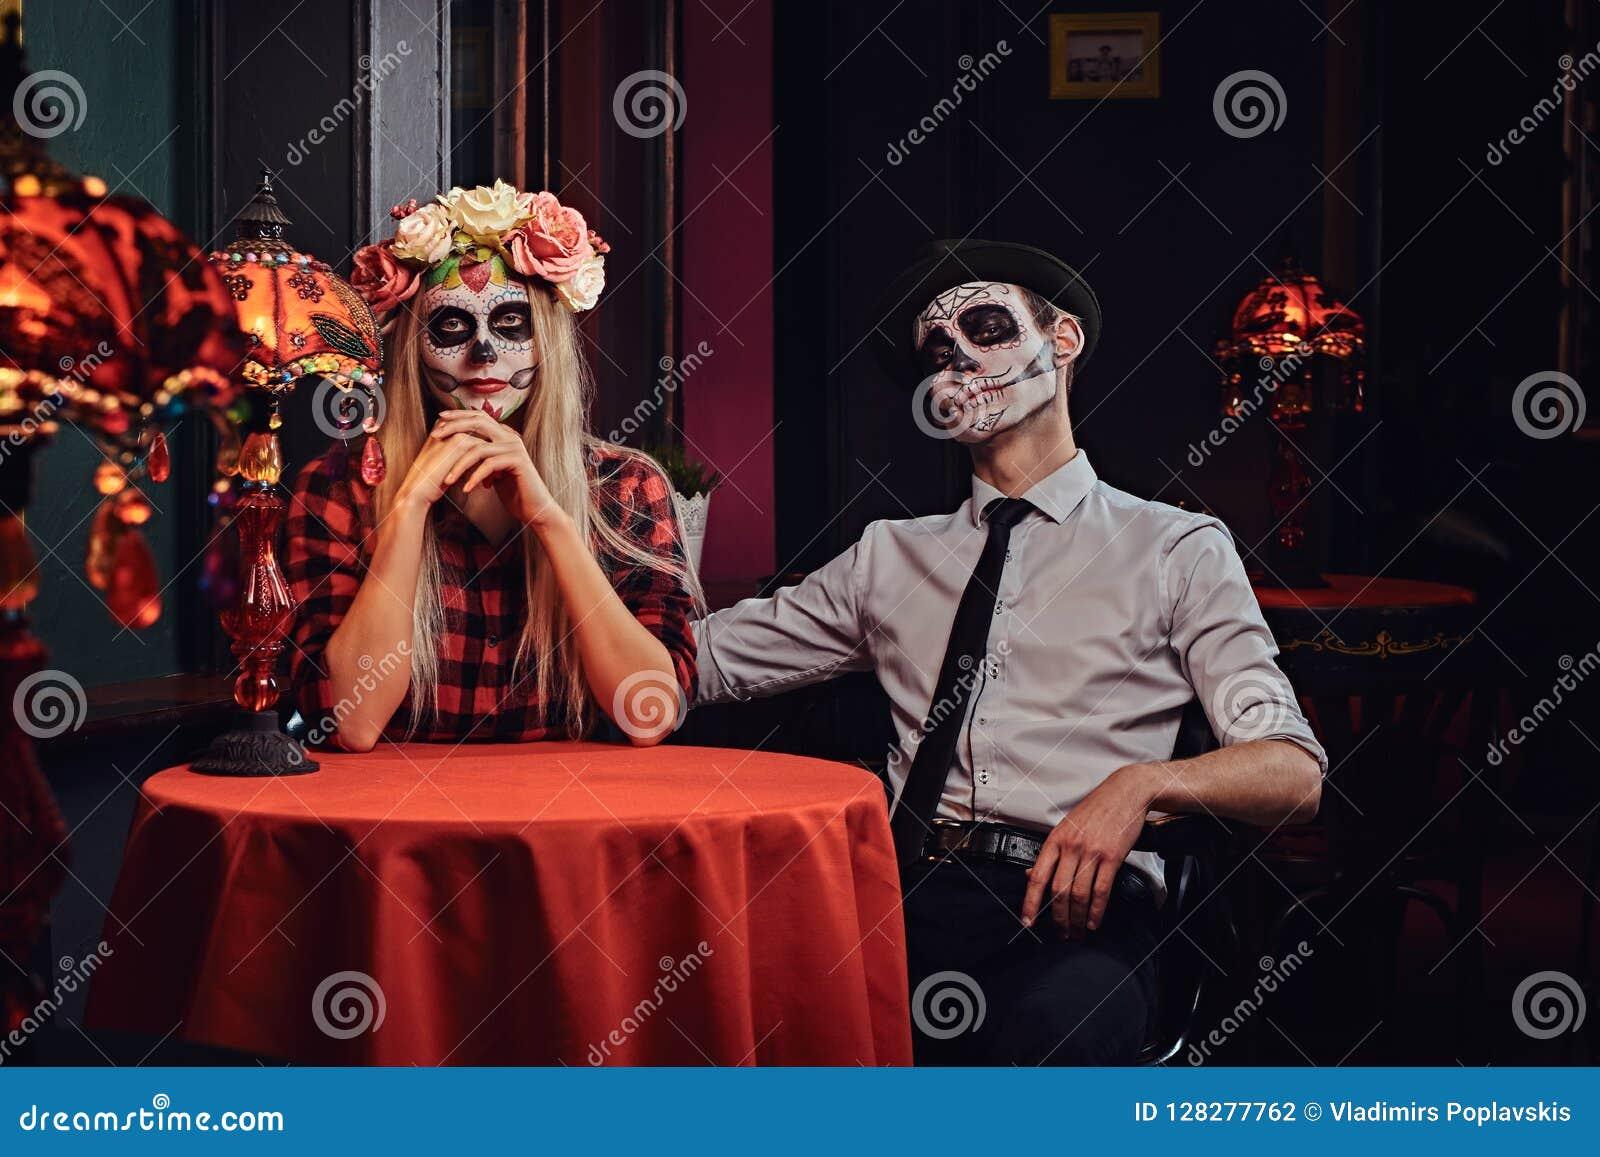 Dating masquerade